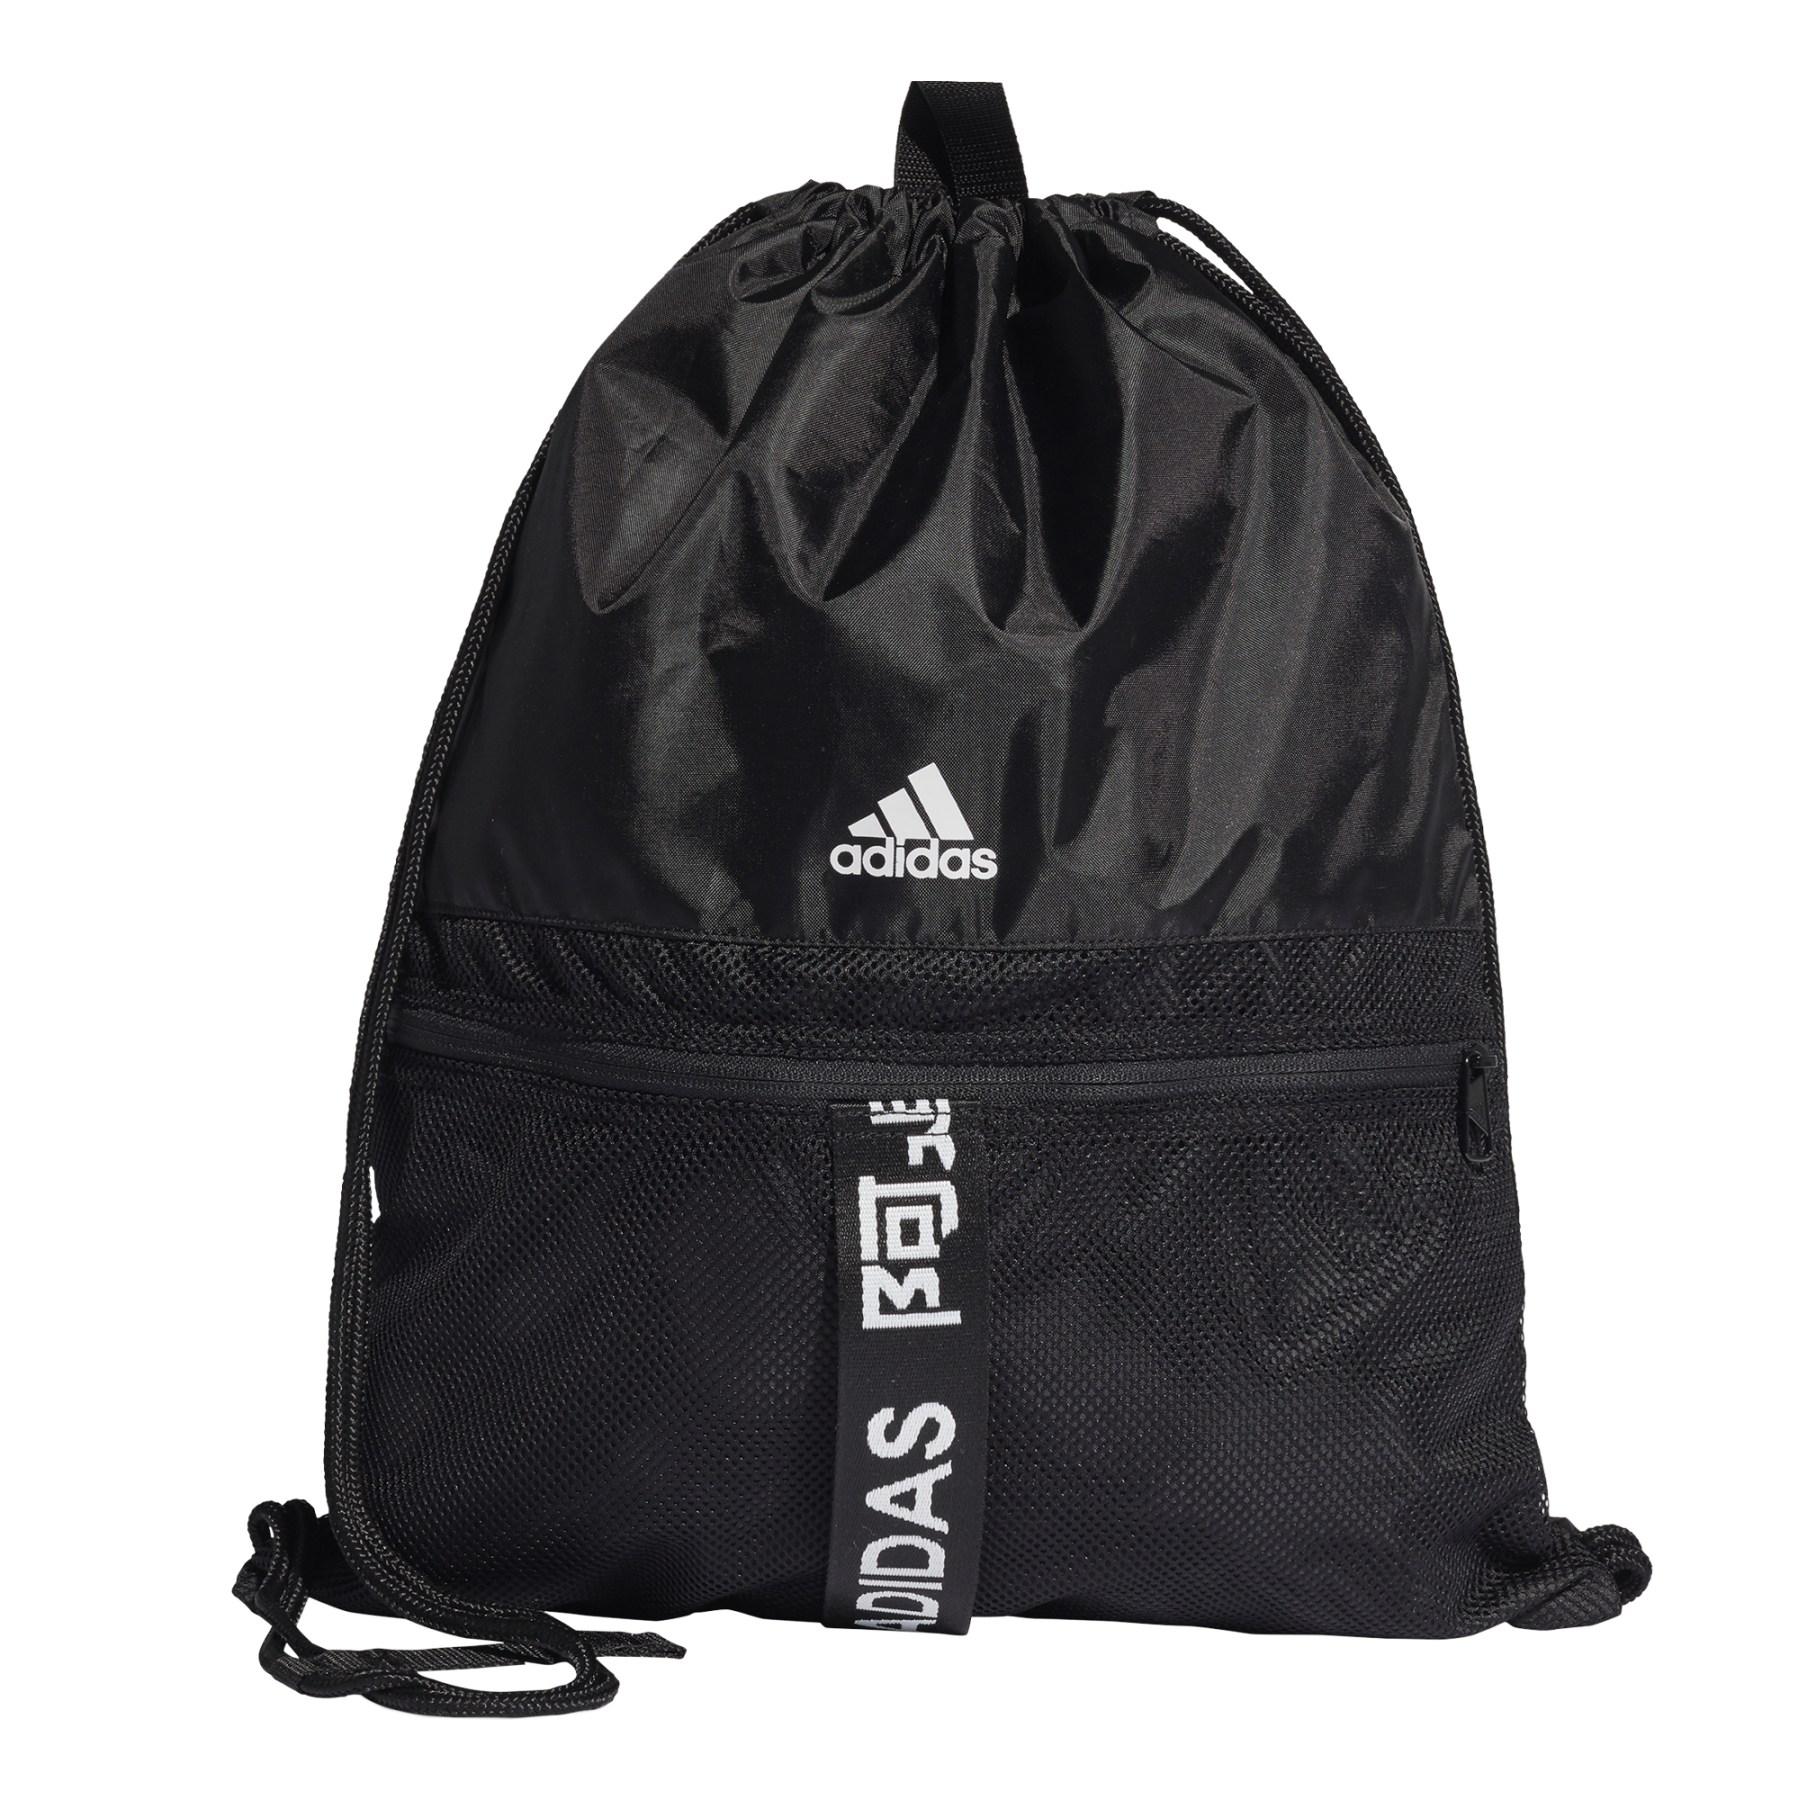 Picture of adidas 4ATHLTS Training Bag - black/black/white FJ4446